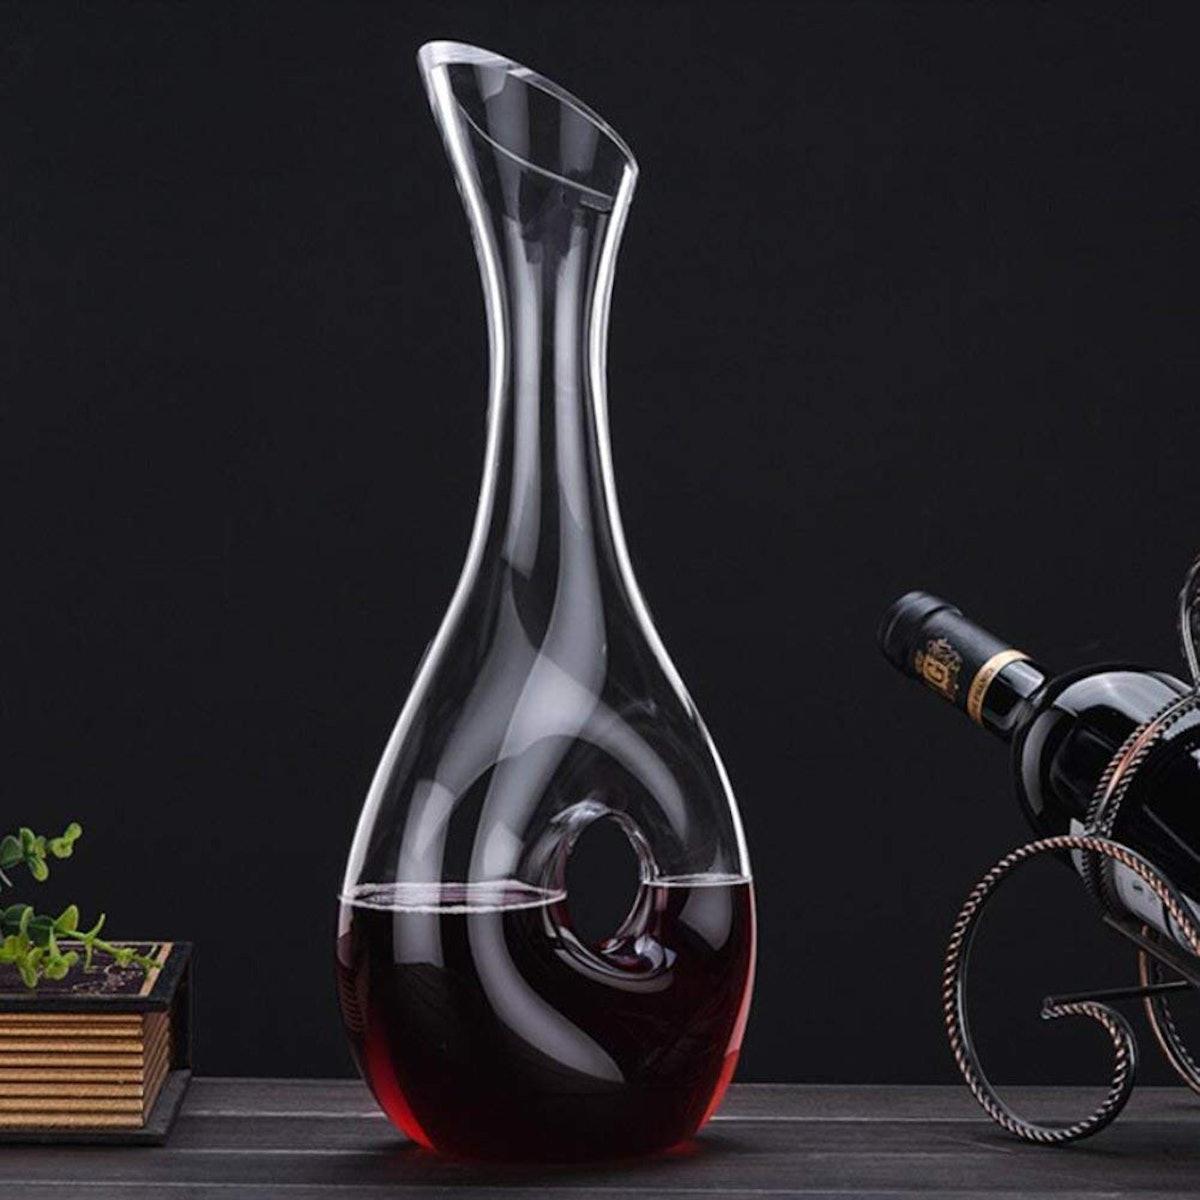 USBOQO Wine Decanter